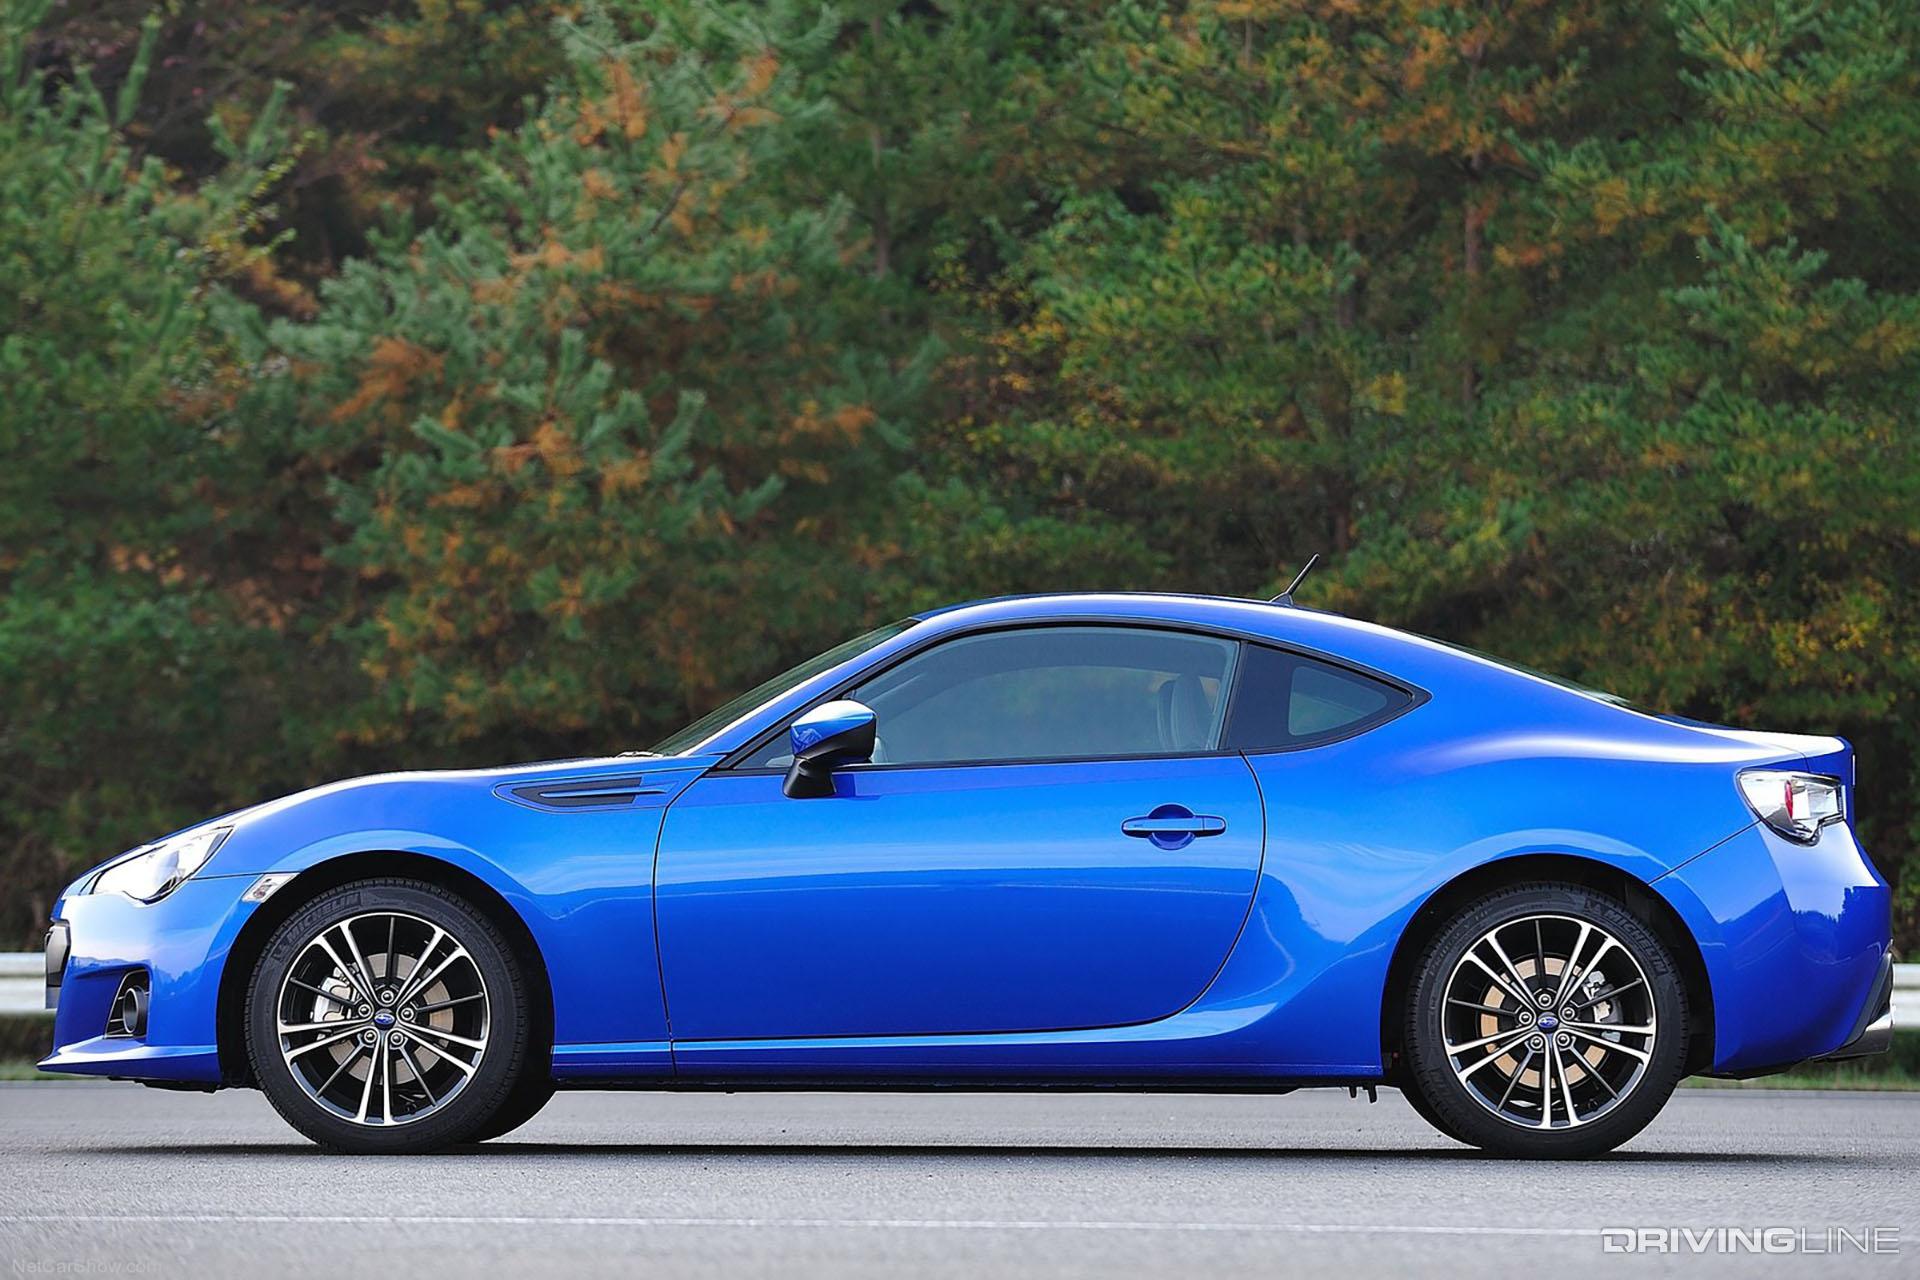 Scion FR-S, Toyota 86 & Subaru BRZ Buyer's Guide | DrivingLine